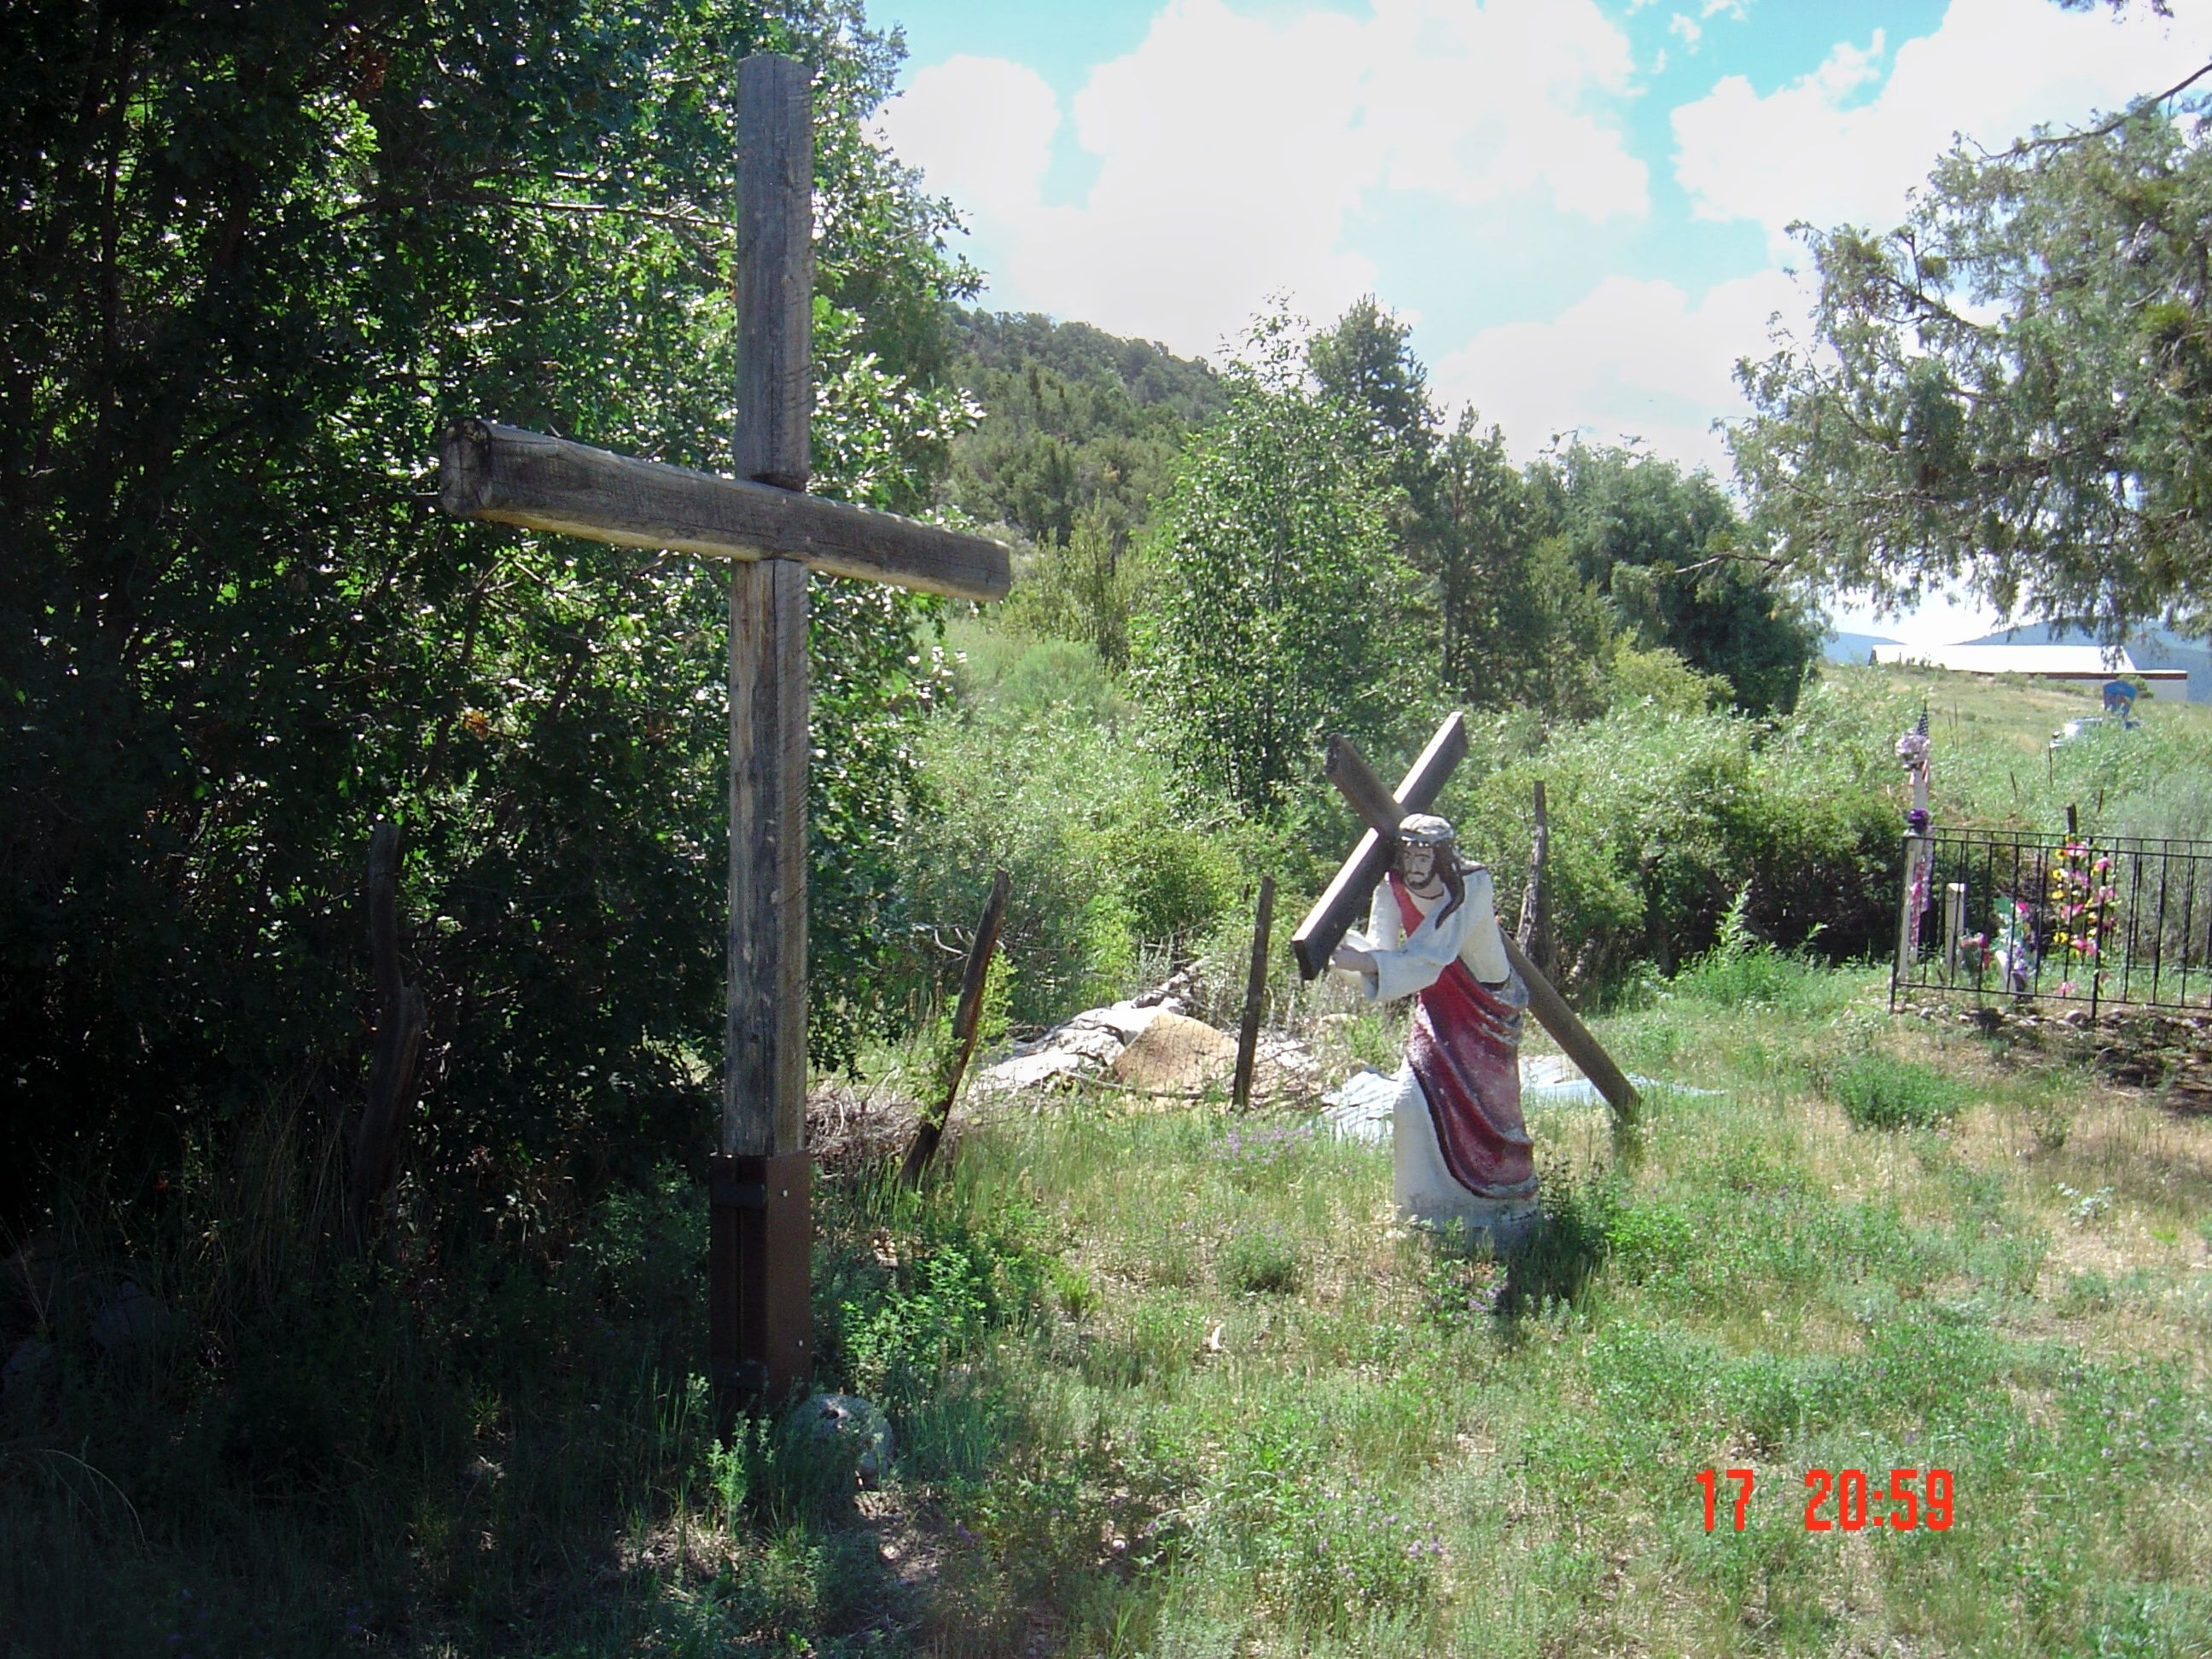 New mexico taos county penasco - Religious Artifacts Outside Of Penasco New Mexico Penitente Morada My Father Remembers This Morada